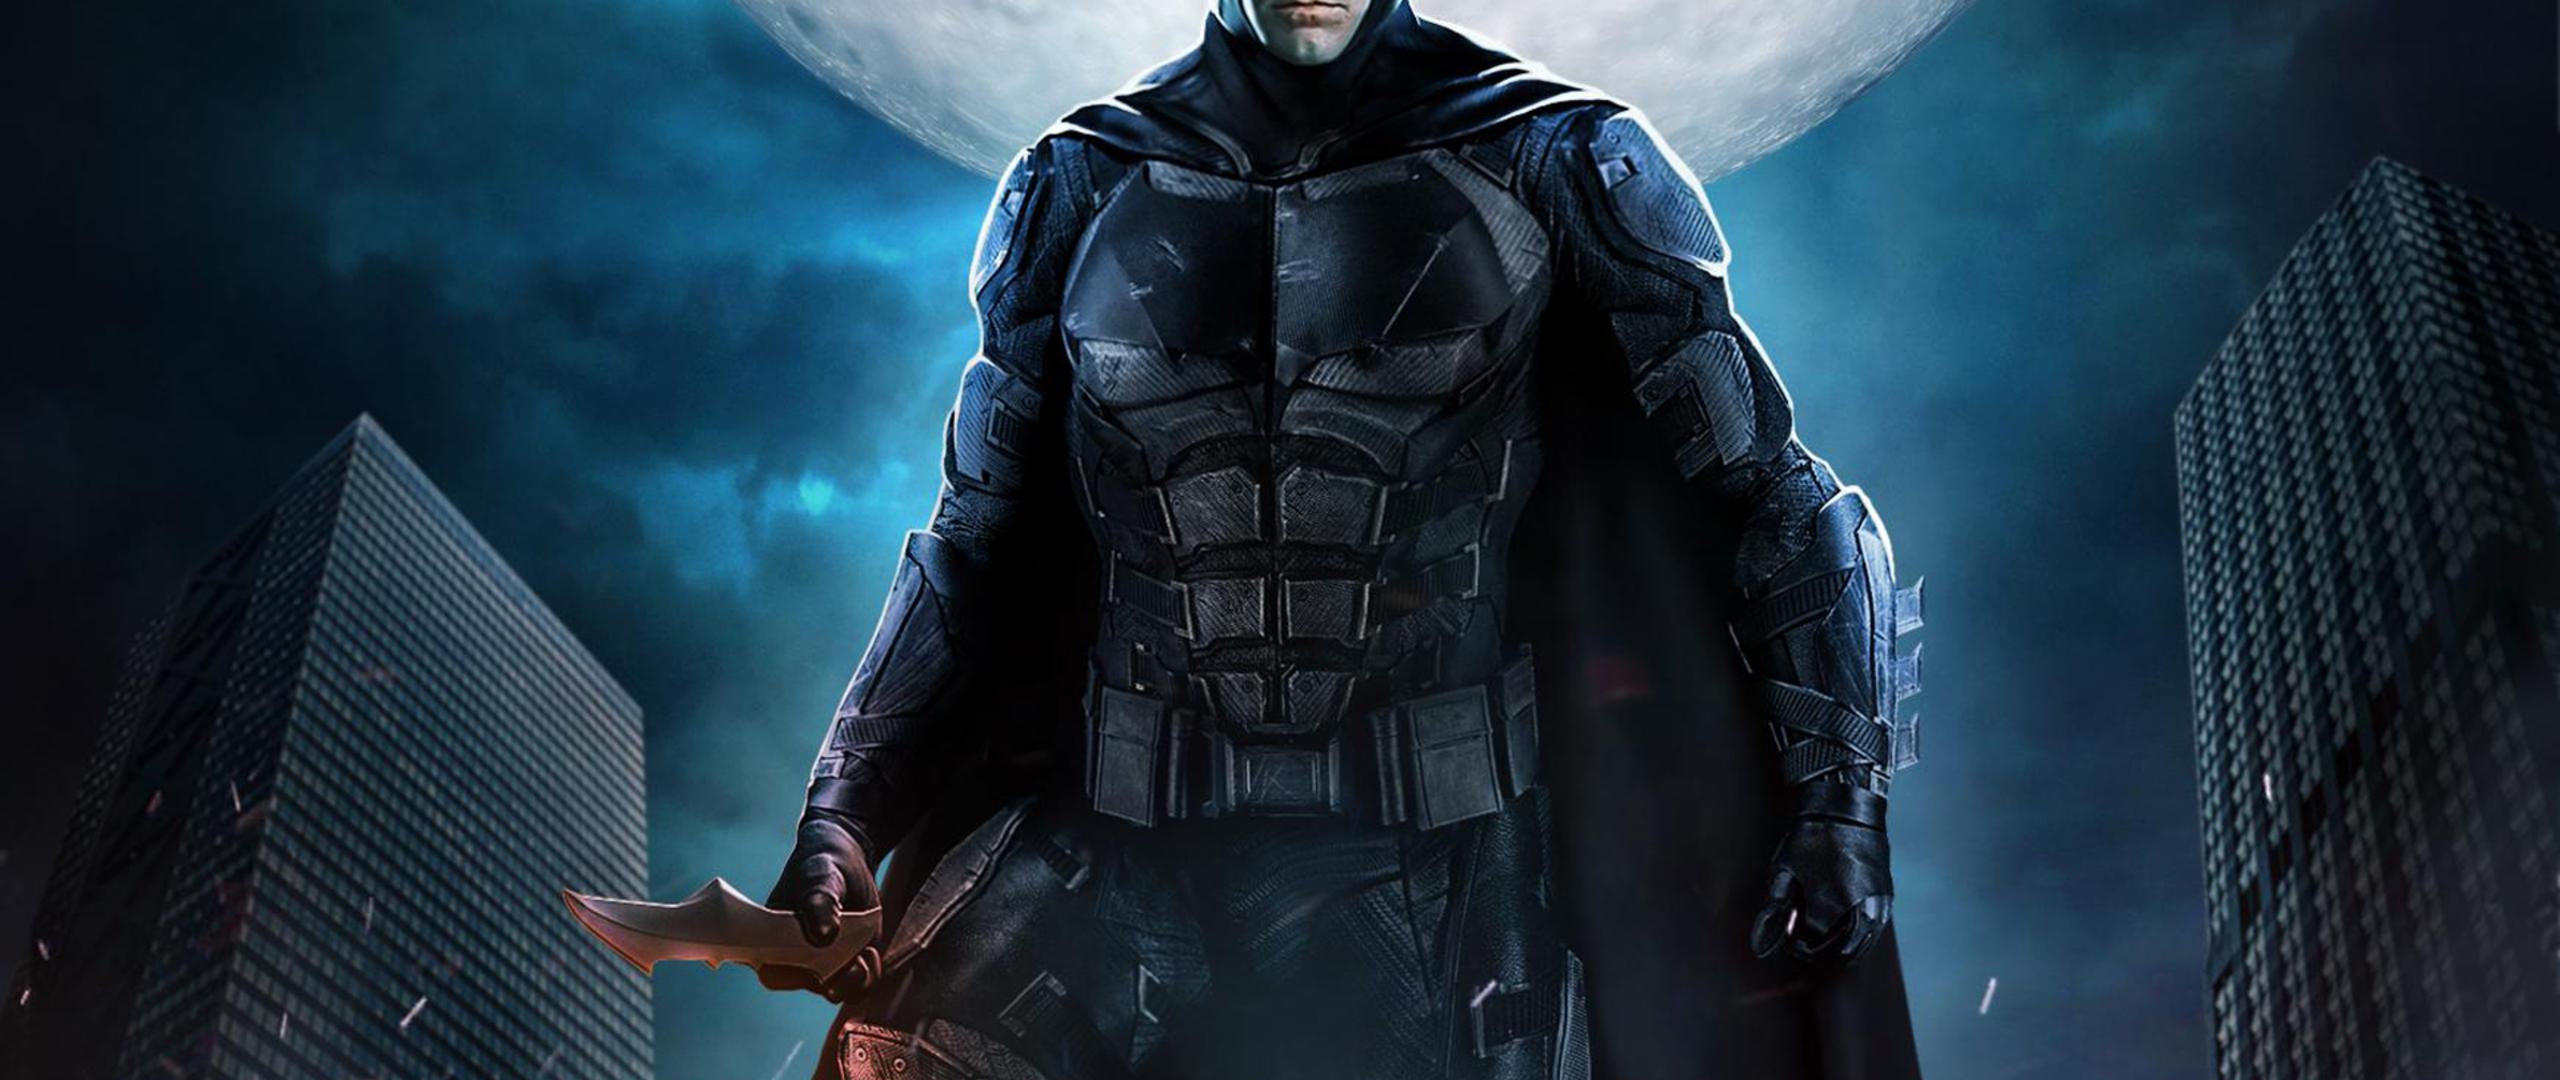 justice-league-batman-the-dark-knight-fan-art-uv.jpg